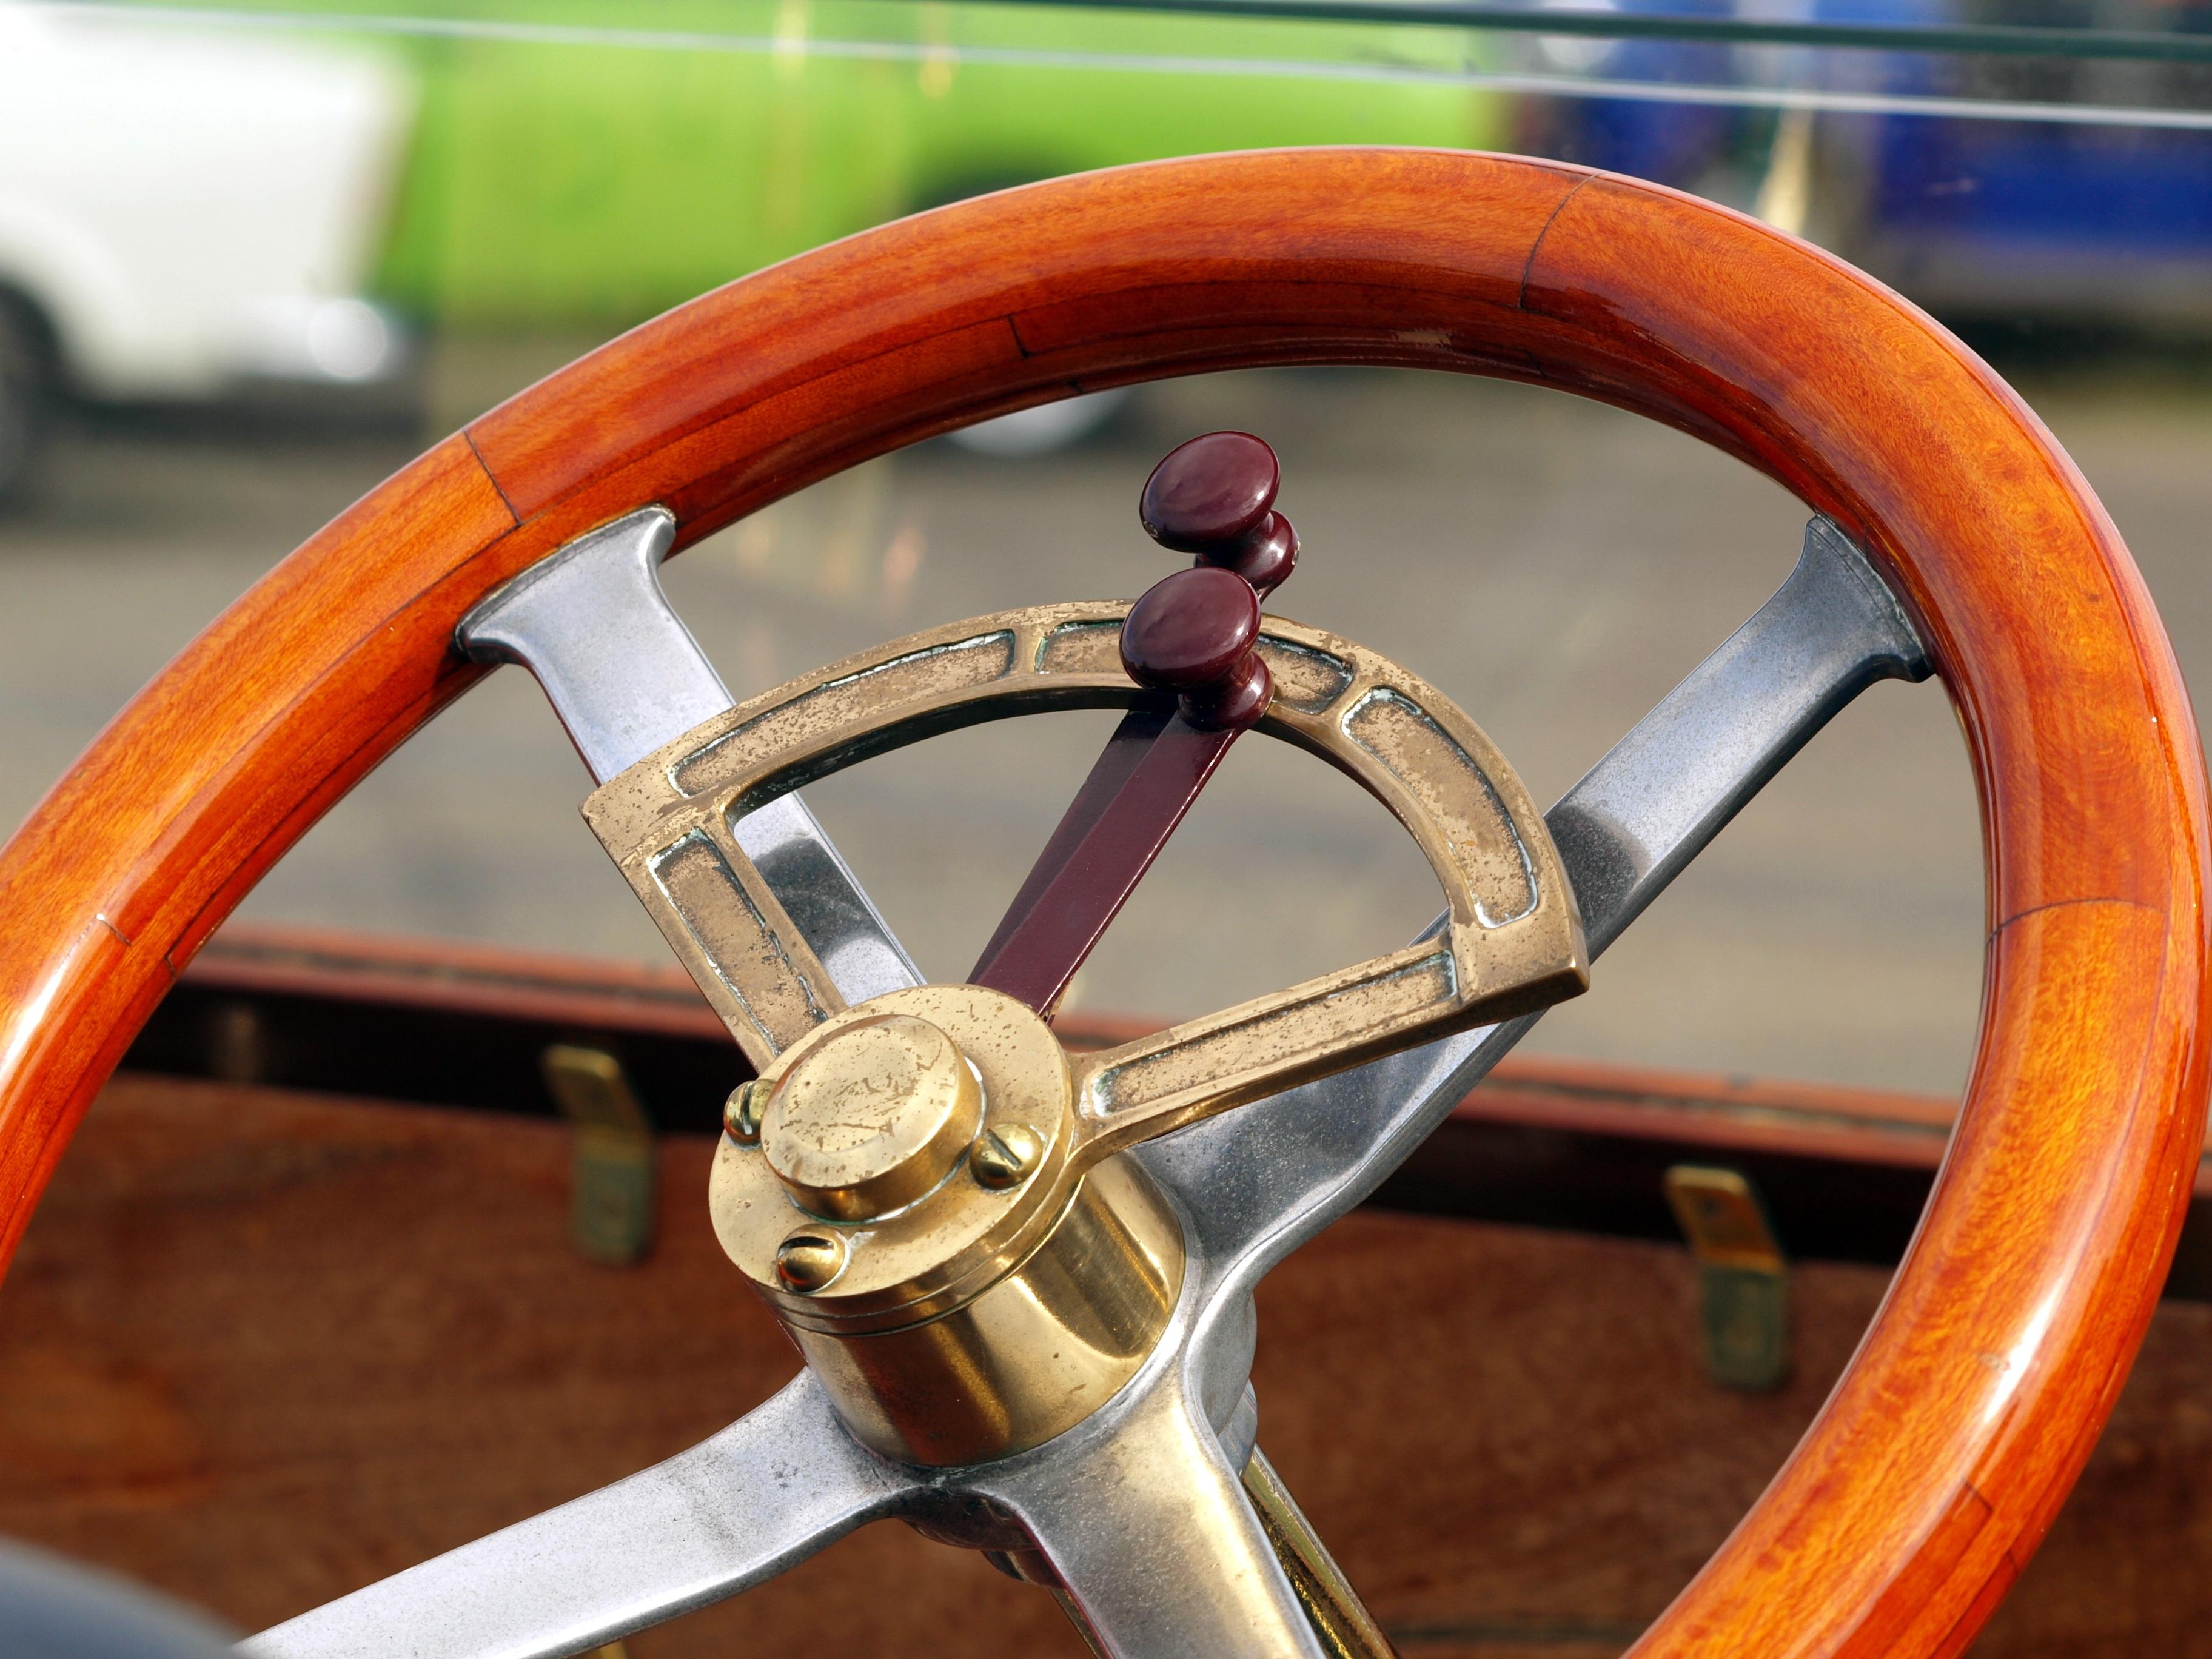 Kostenlose foto : Auto, Jahrgang, Antiquität, Rad, Automobil, Retro ...